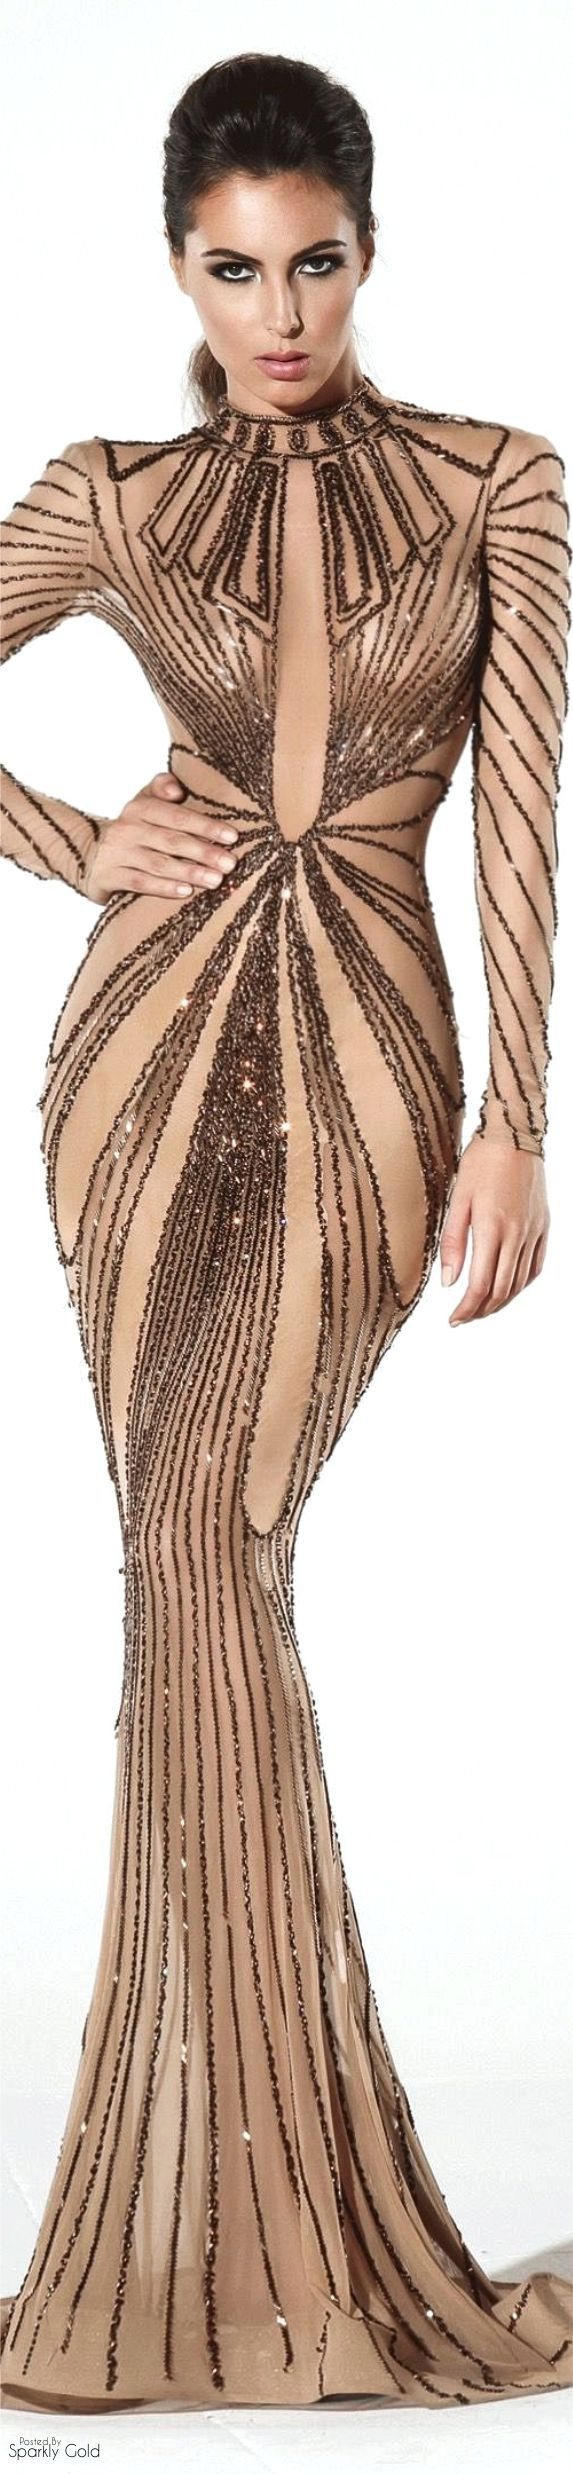 Sightly prom dressesprom maxi dress uniors dresses